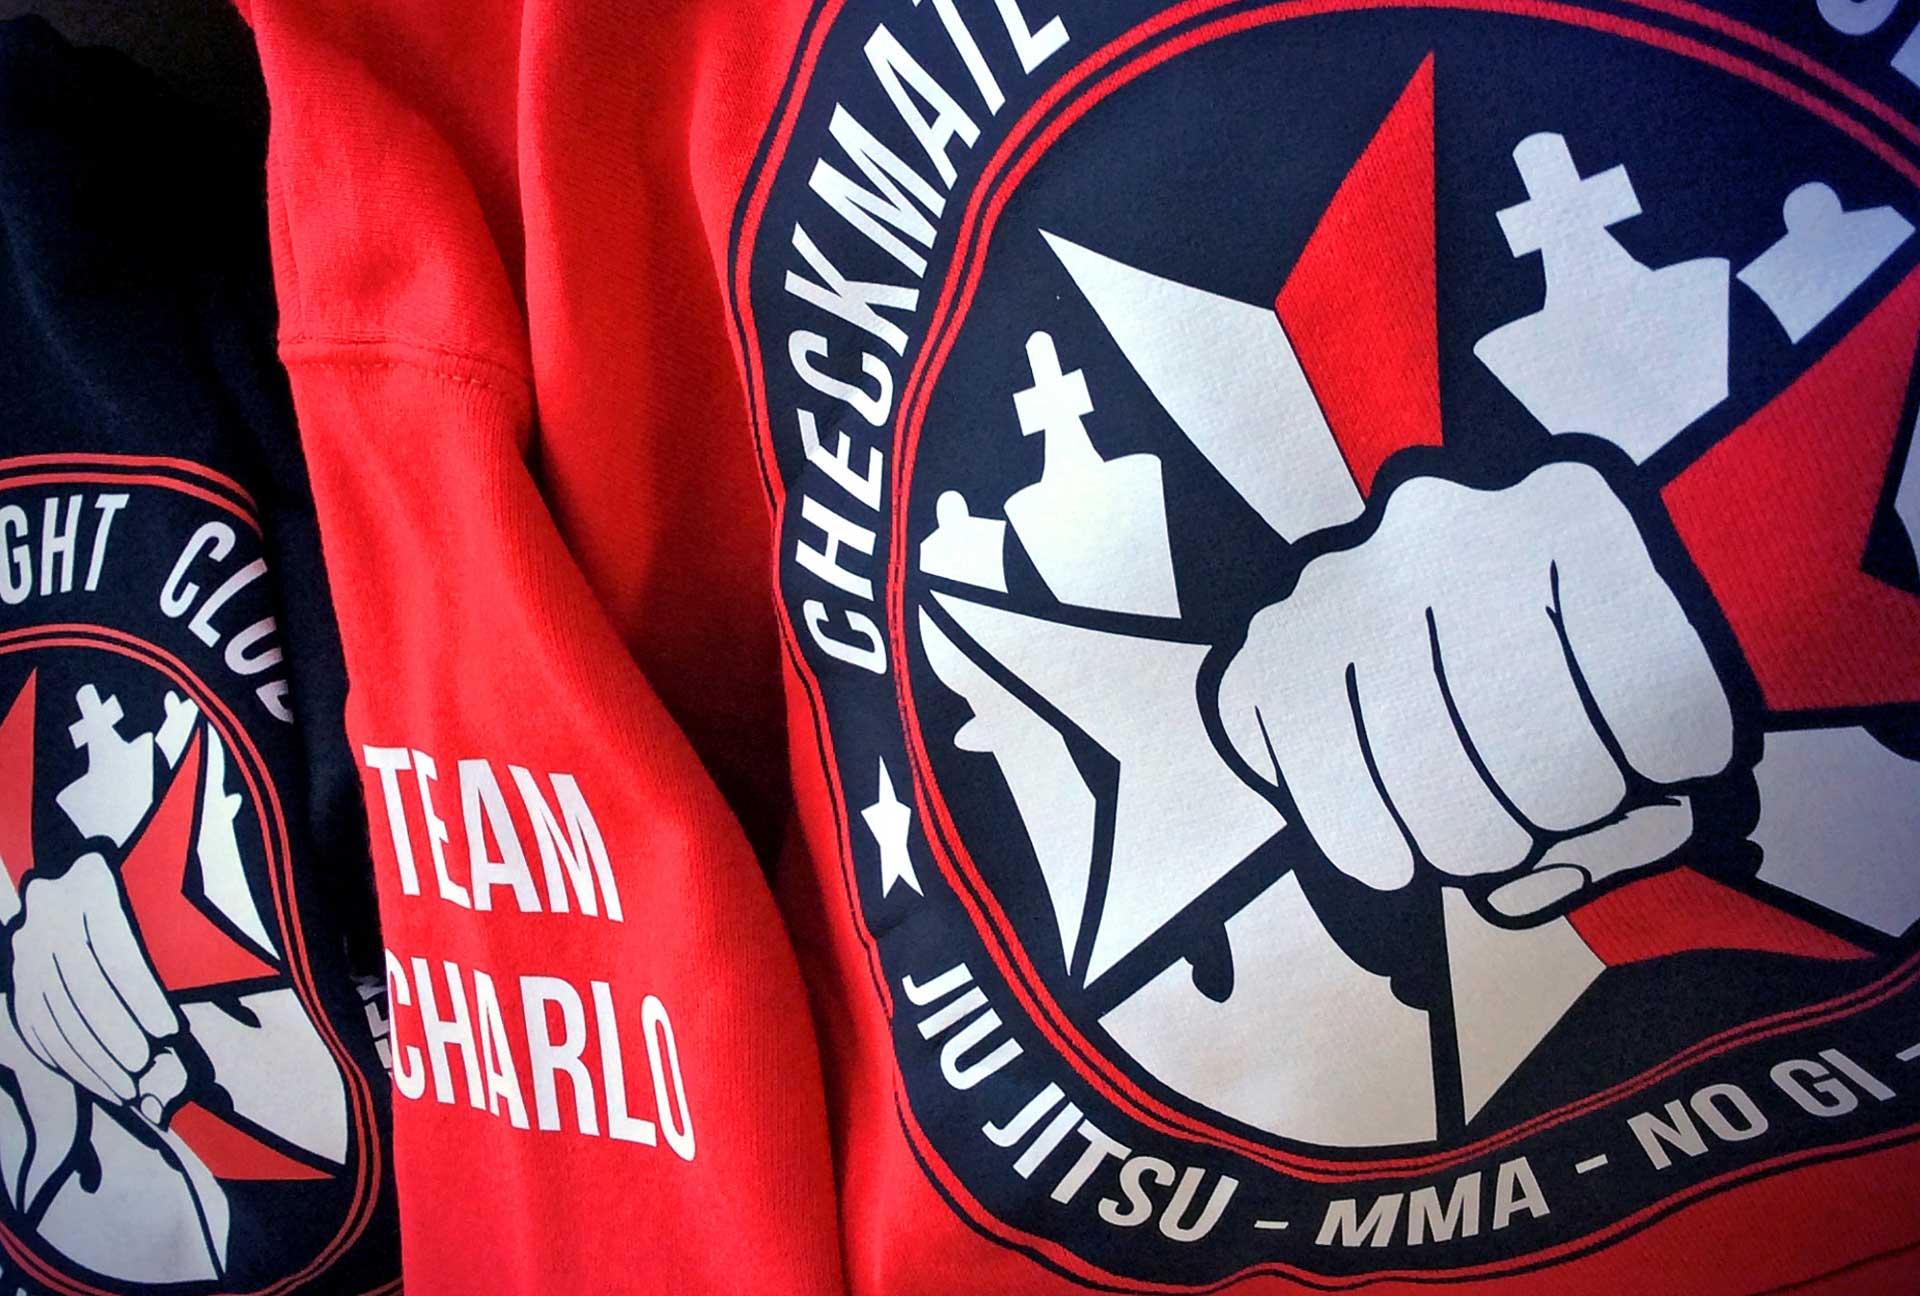 Uniform & Kits - Checkmate Fight Club